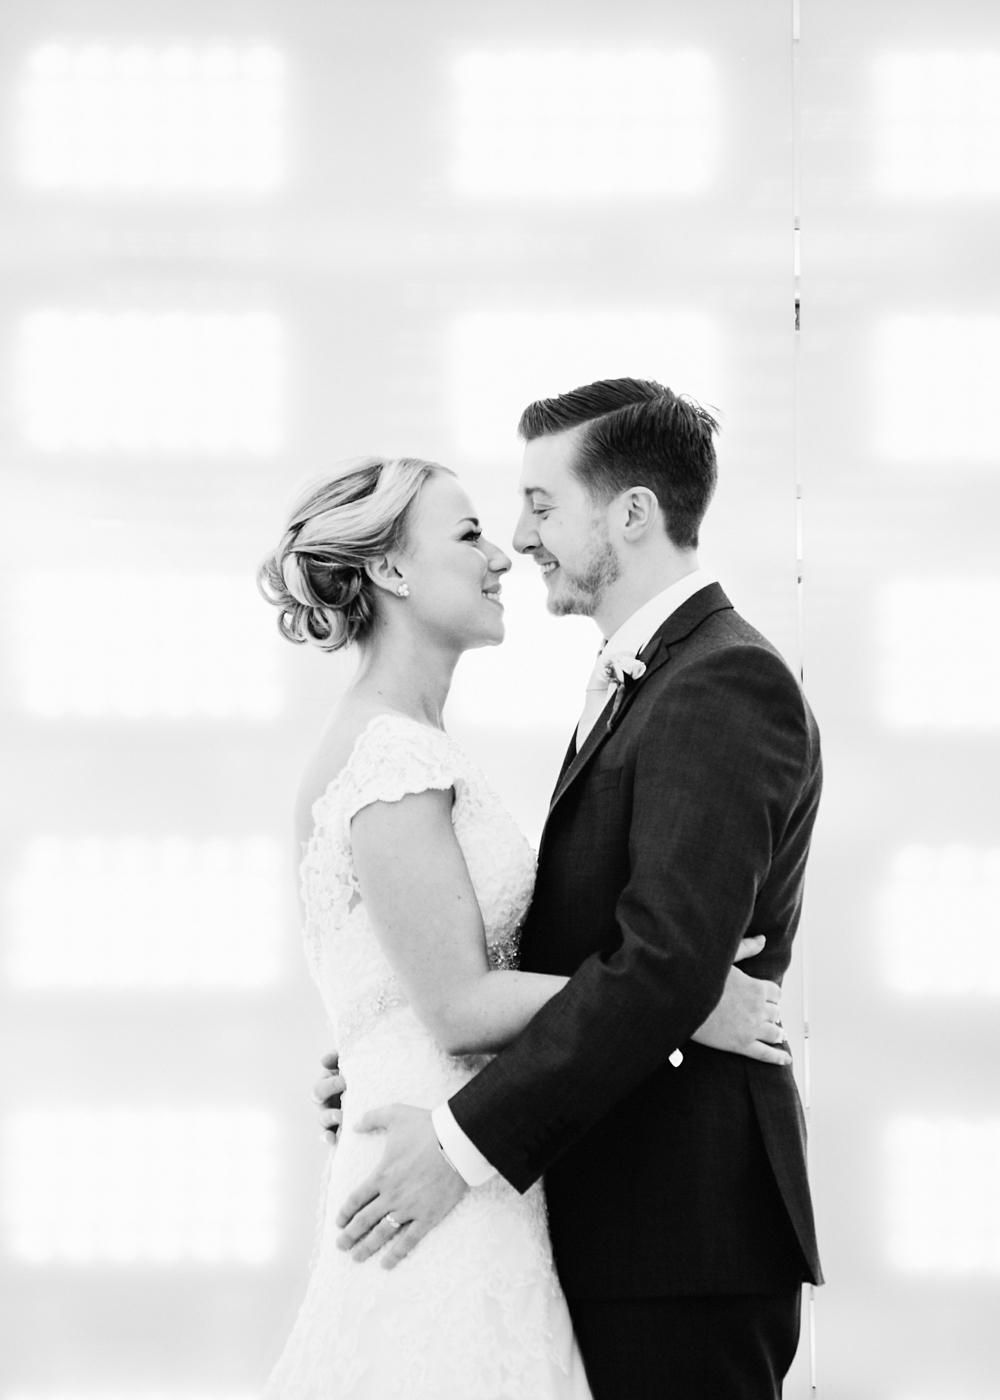 NYC intimate wedding by Tanya Isaeva Photography